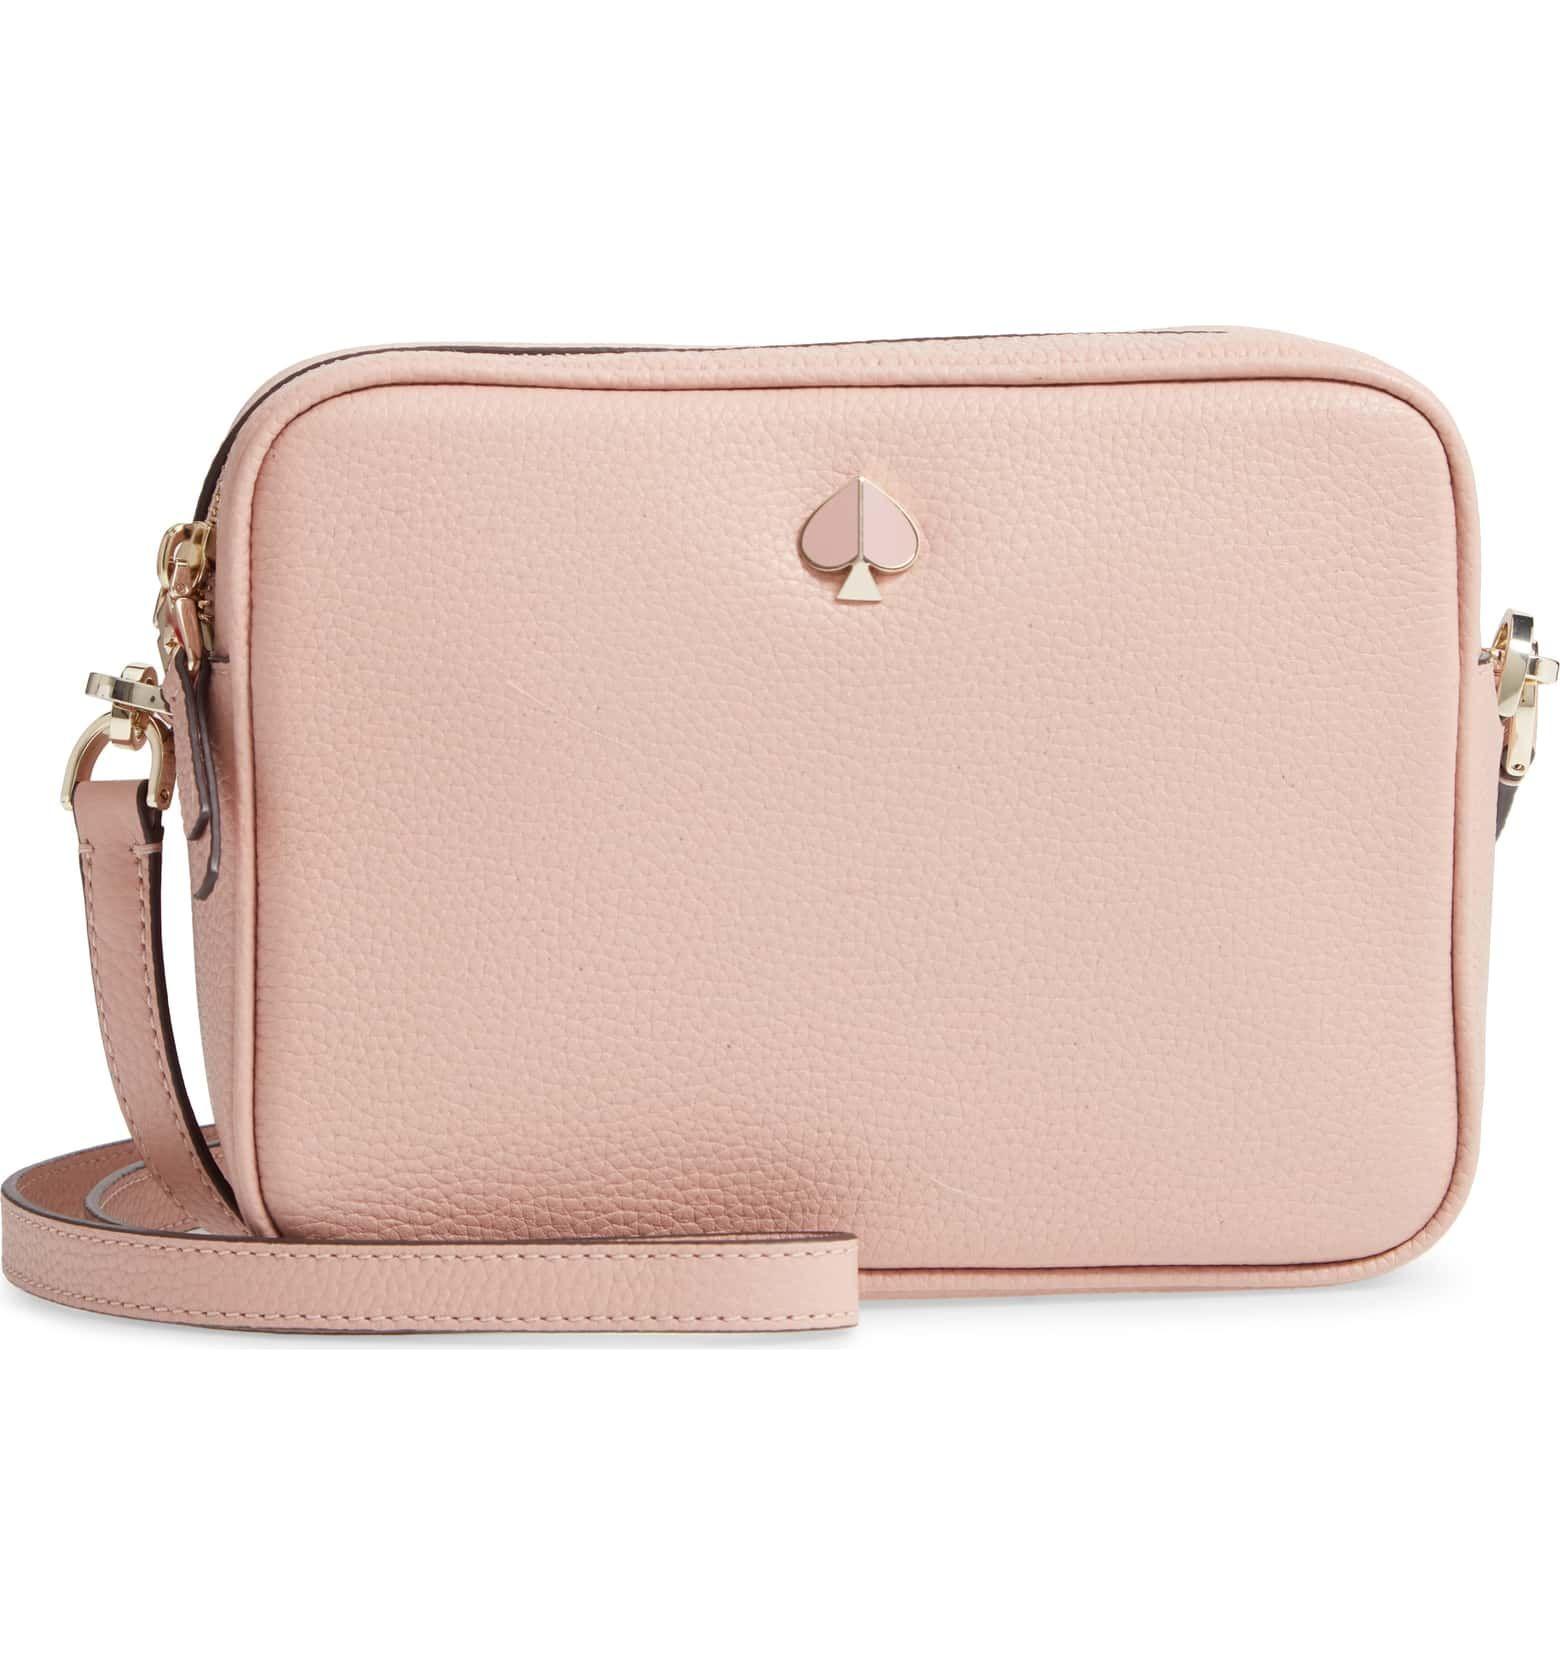 Kate Spade New York Medium Polly Leather Camera Bag Nordstrom Leather Camera Bag Leather Bags